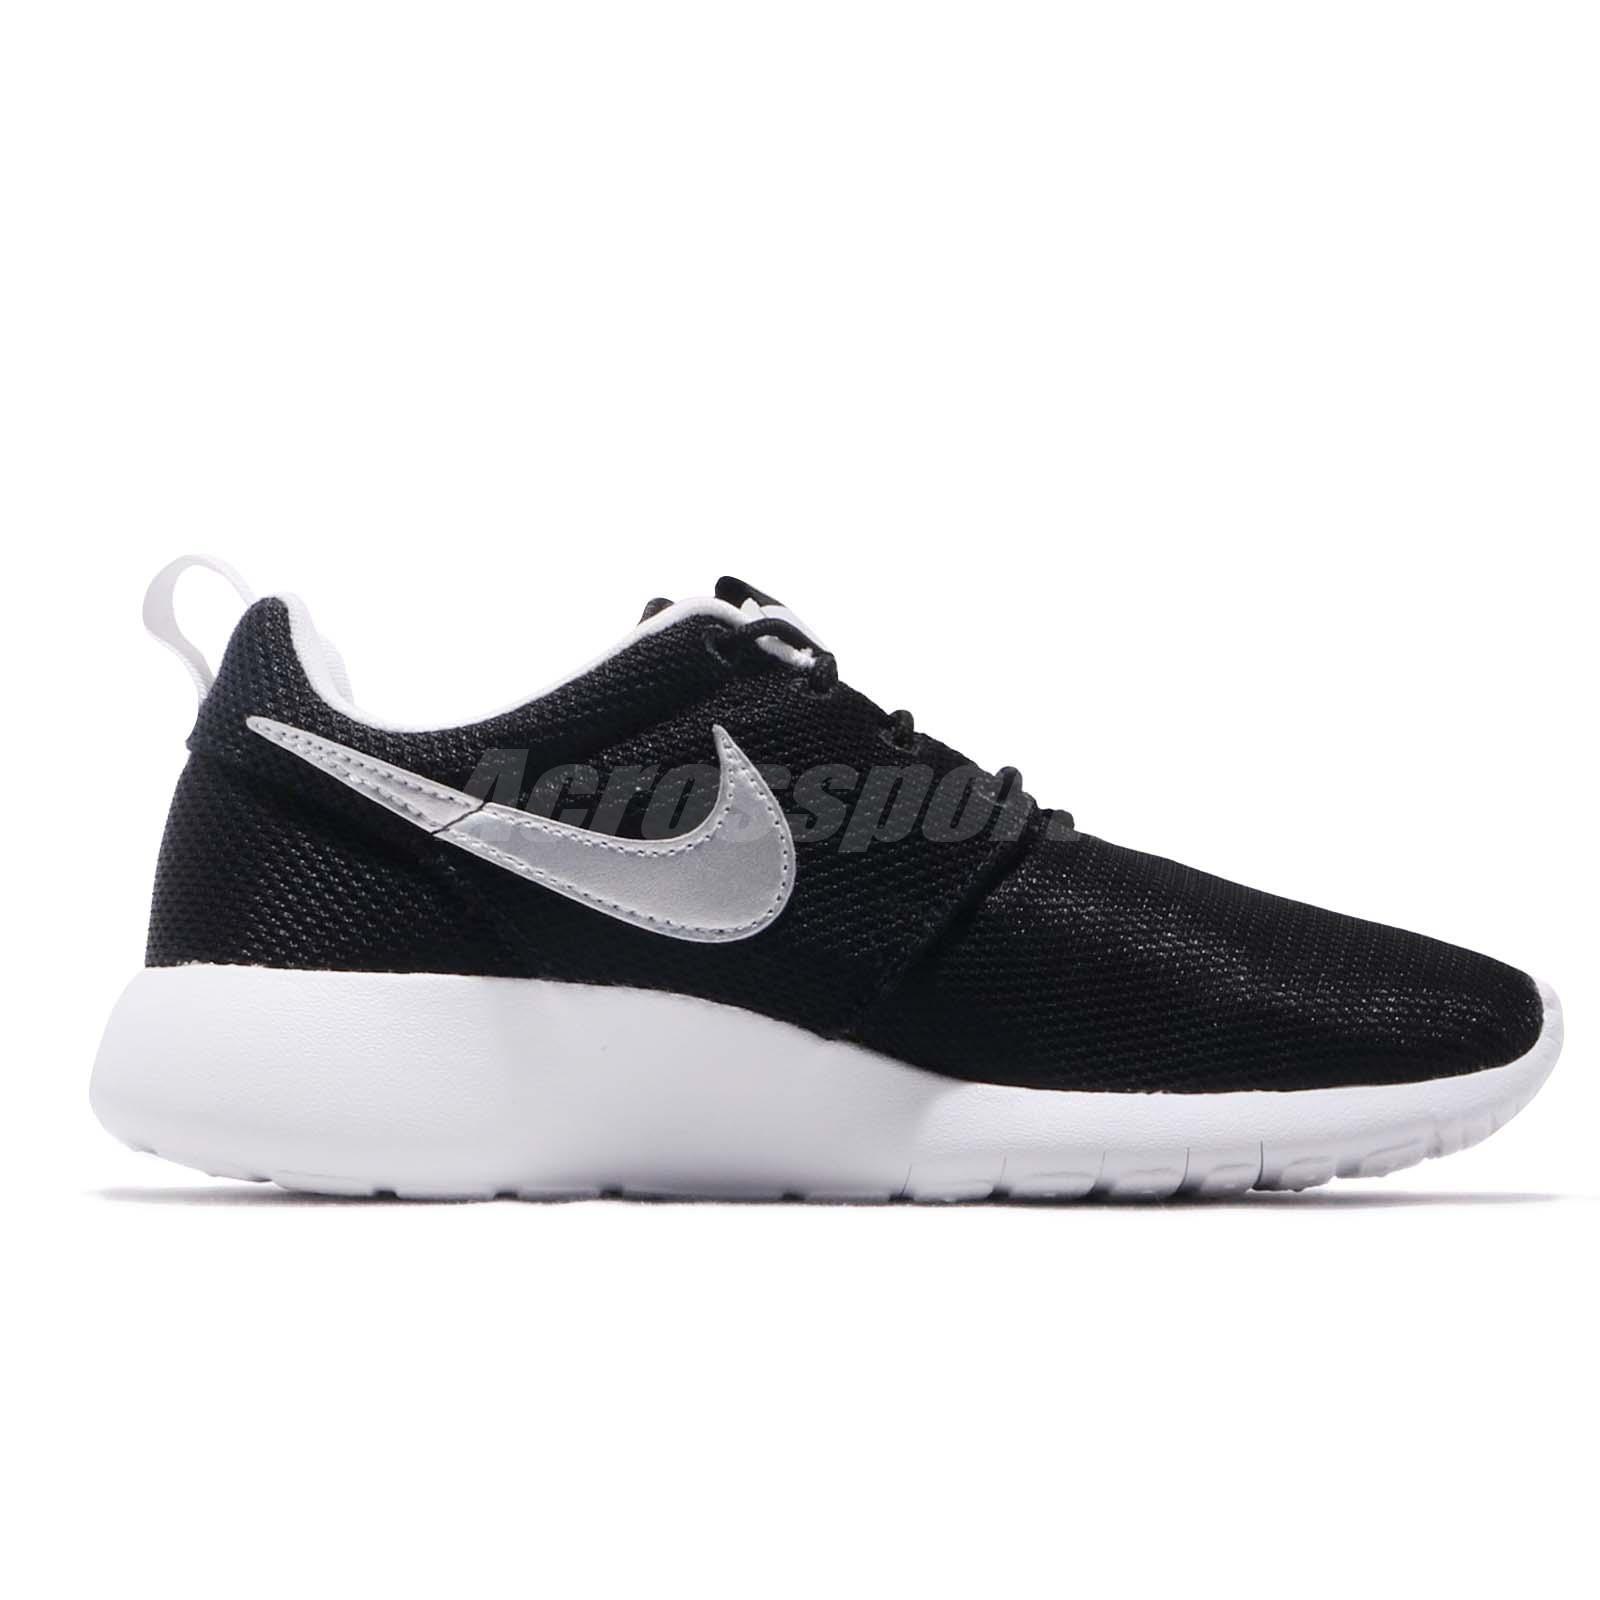 best sneakers dc41f 11298 nike kids rosherun gs running shoe women sneakers Negozi Nike Air Max BW  Donna ...